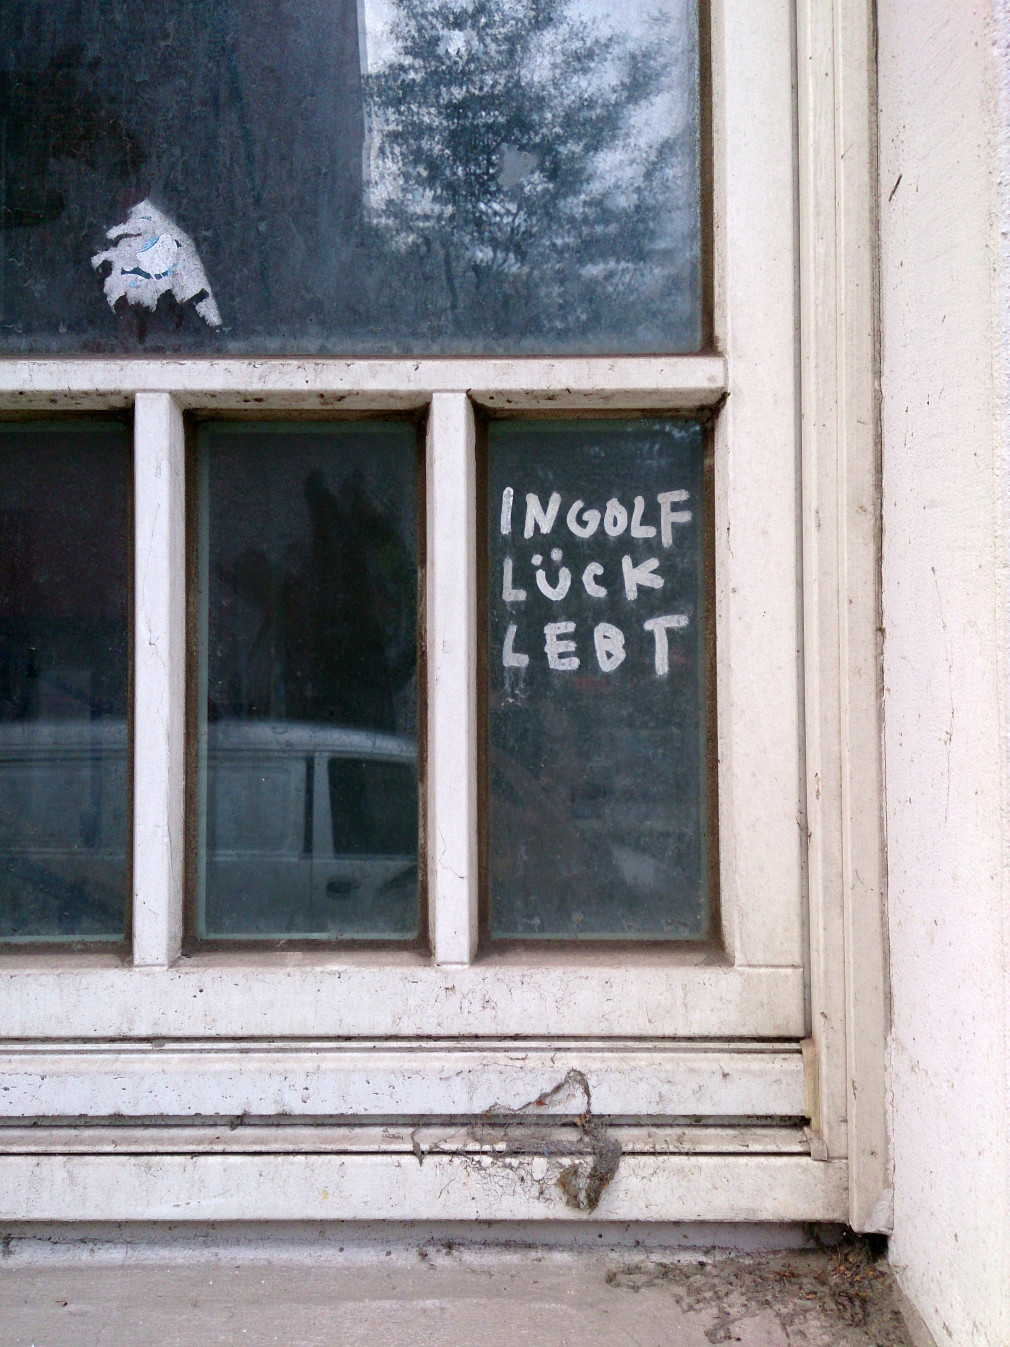 """Ingolf Lück lebt"""